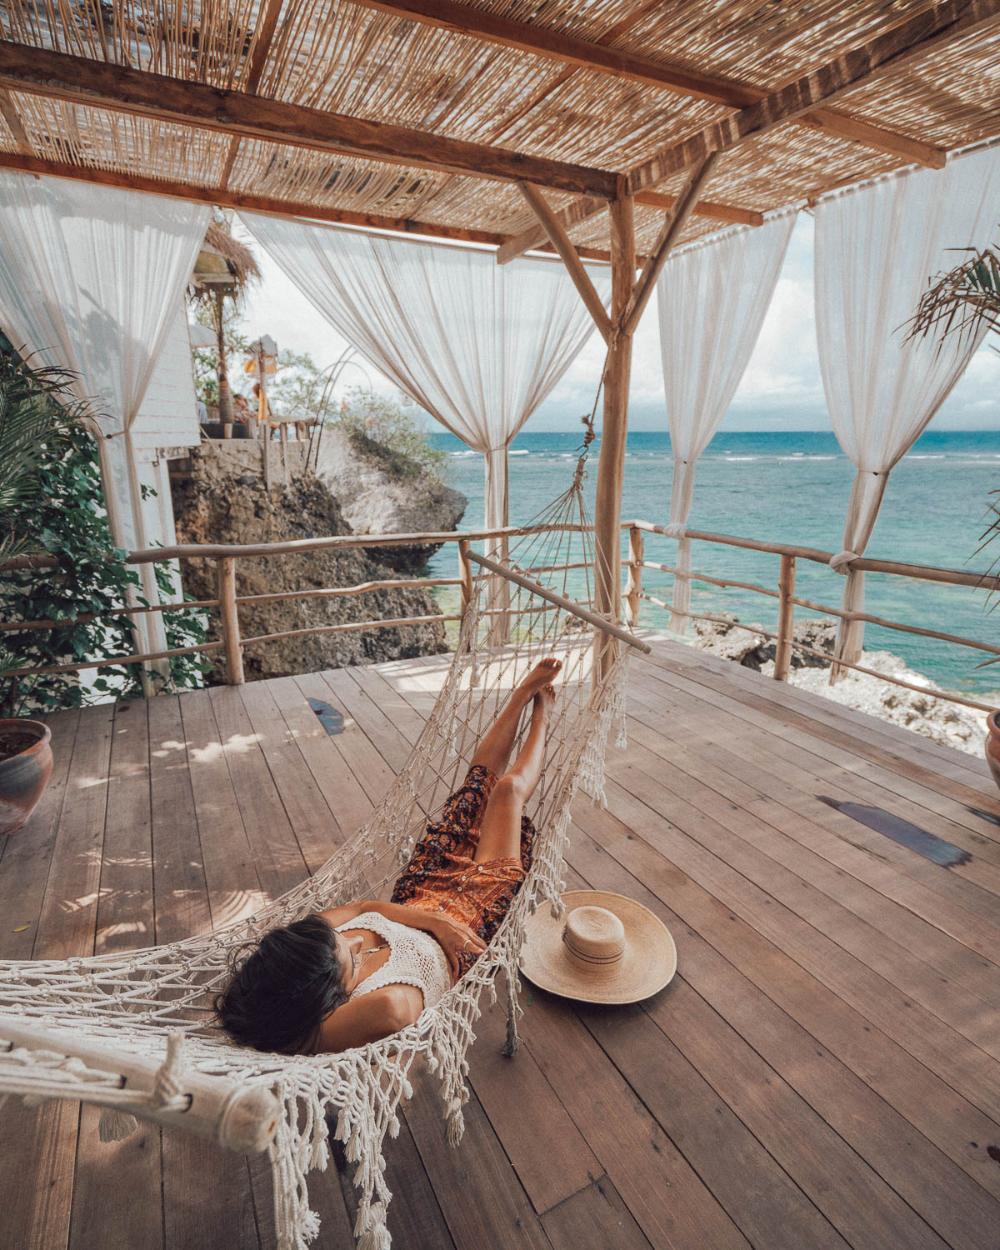 Best places to stay in Uluwatu, Bali · Dreamsea Surf Camp